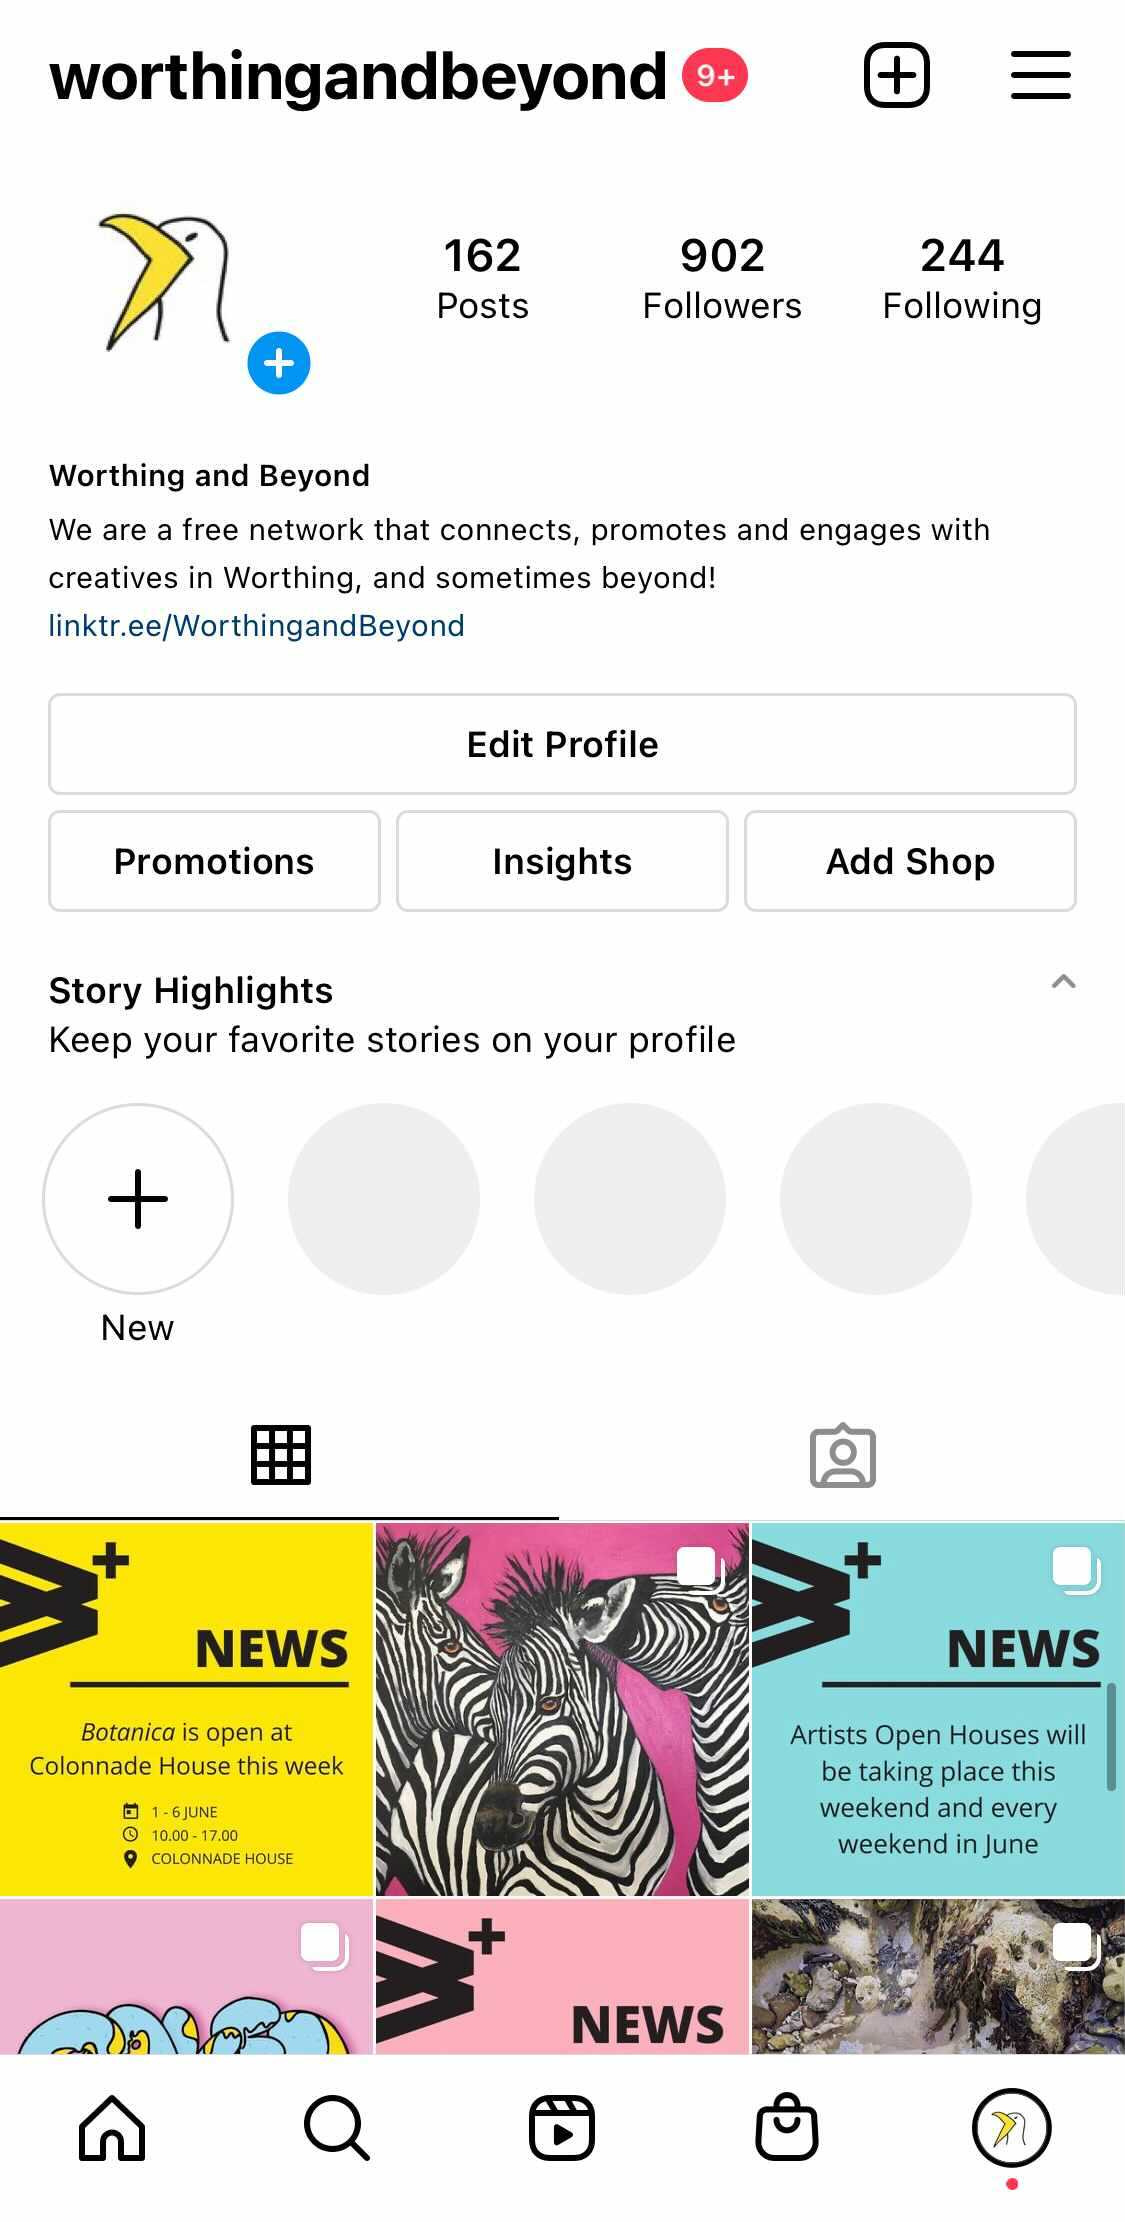 The @WorthingandBeyond Instagram grid as of 3/6/21